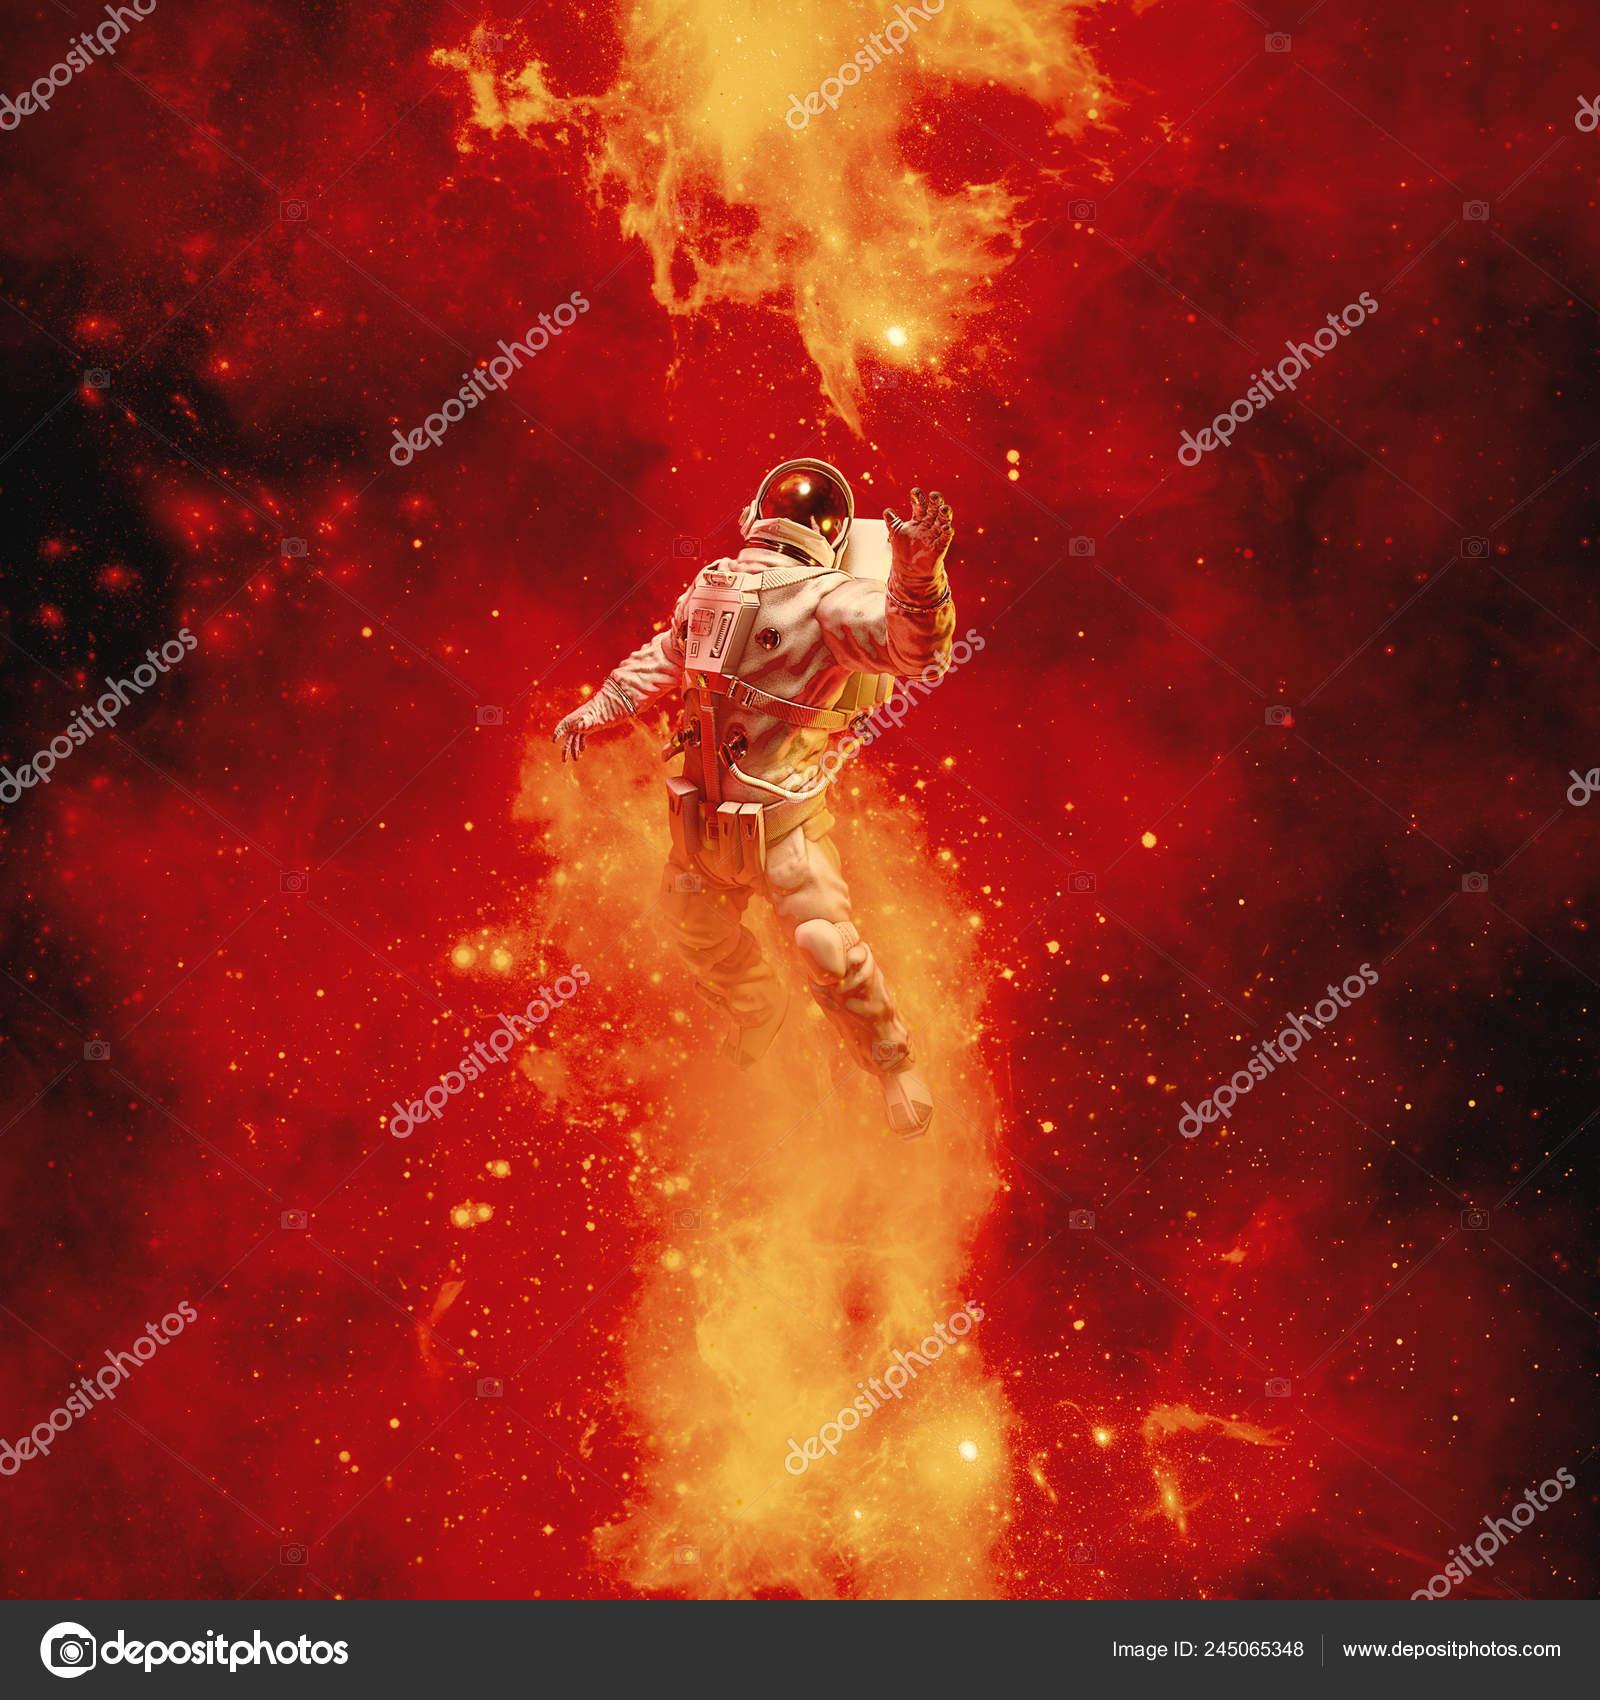 Heaven Reach Illustration Science Fiction Scene Astronaut Floating